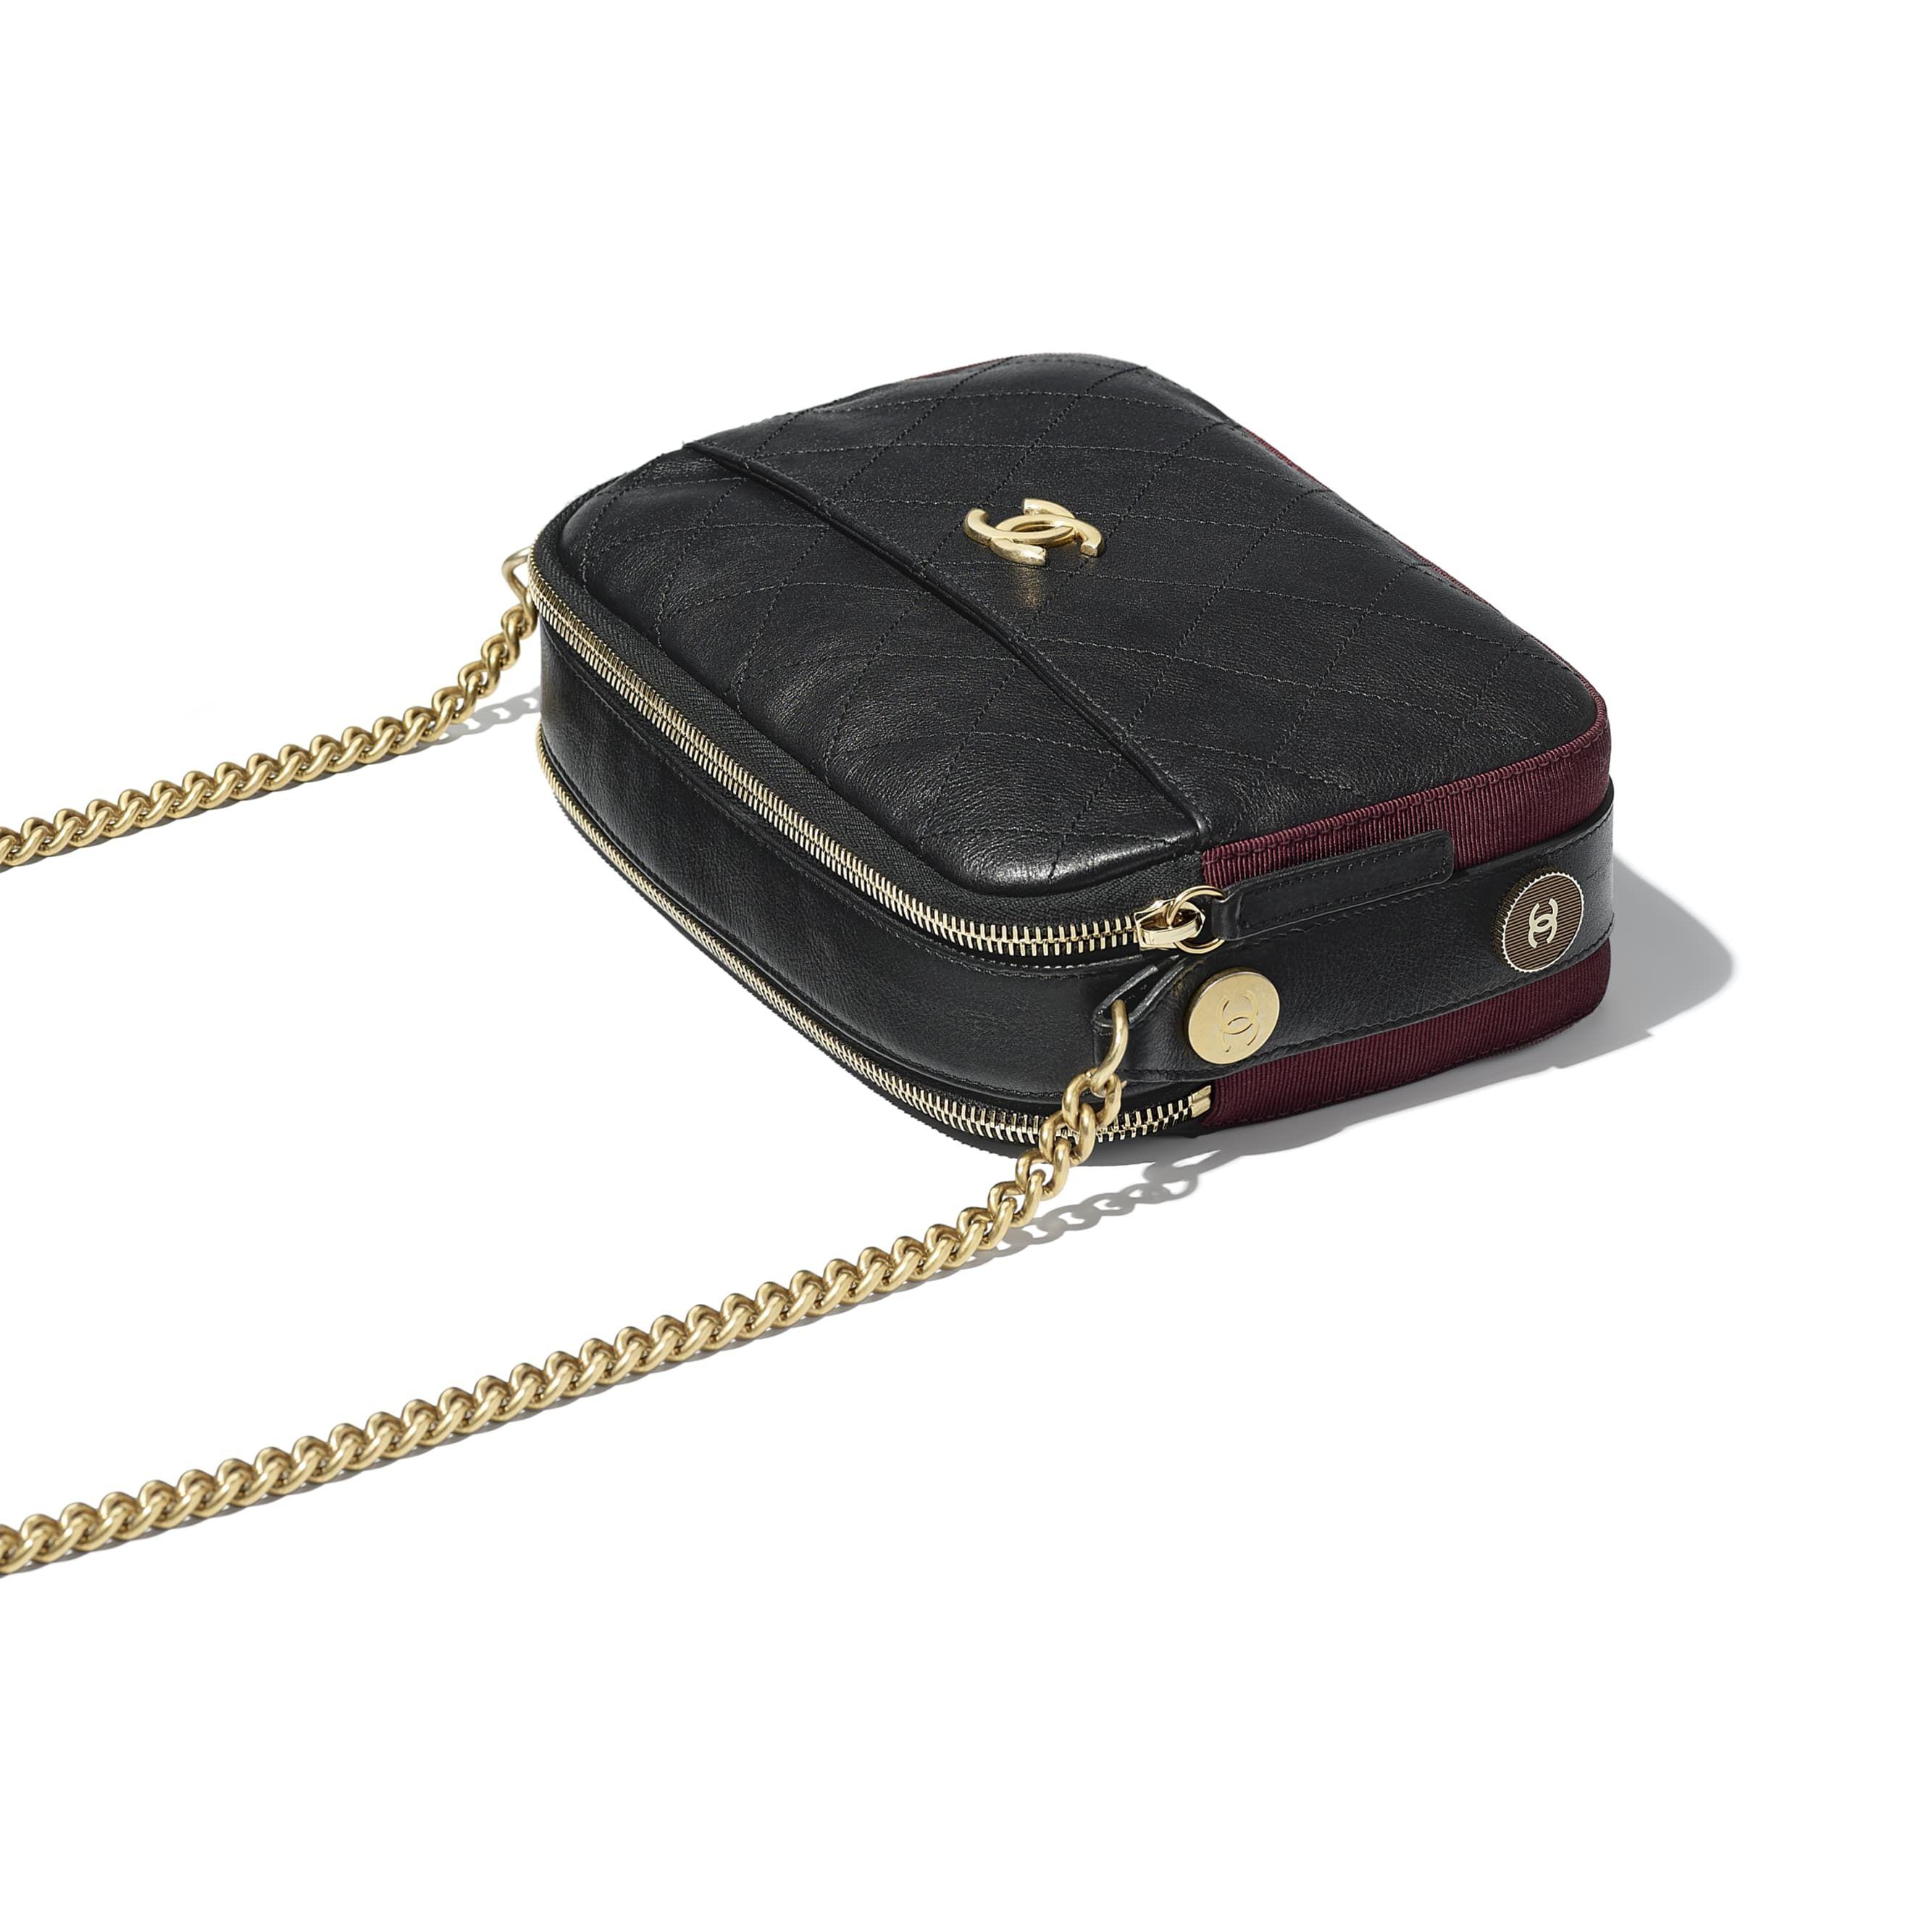 1268dc821f96 Calfskin, Grosgrain & Gold Tone Metal Black & Burgundy Camera Case   CHANEL